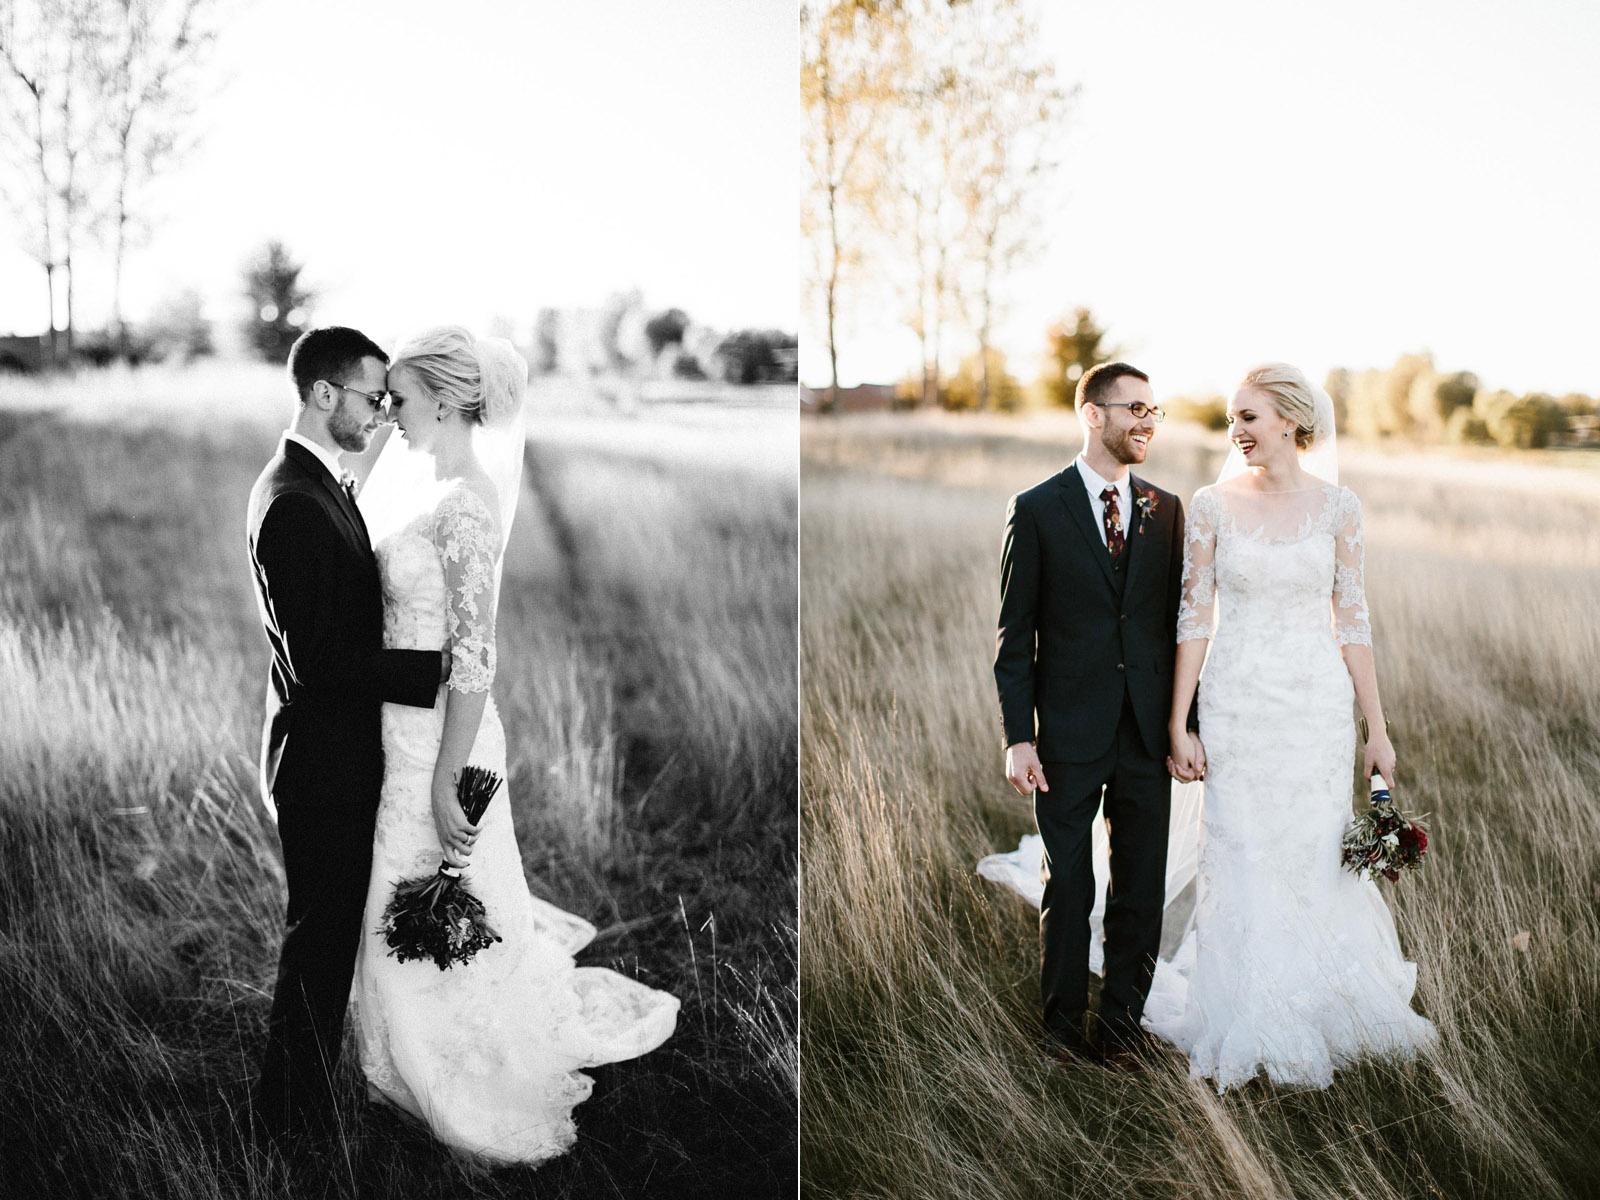 Jenna&Austin_SiouxFalls_Wedding_Photographer_089.jpg